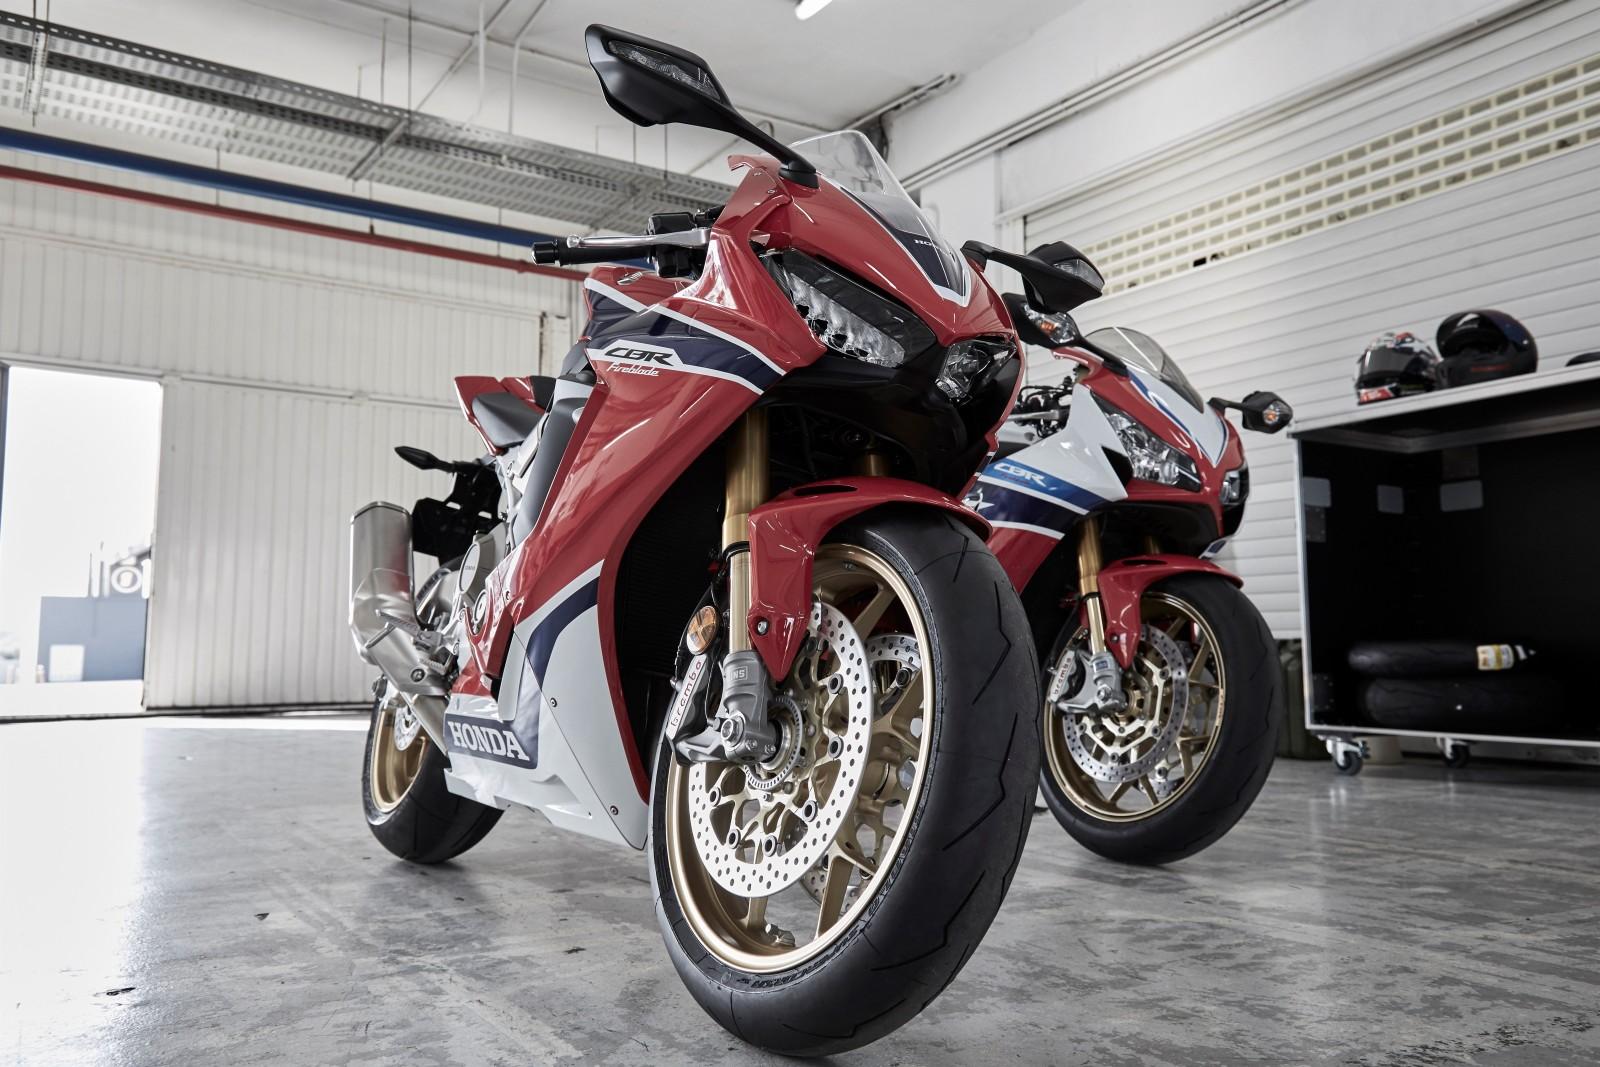 MY17-Honda-CBR1000RR-Fireblade-SP-19